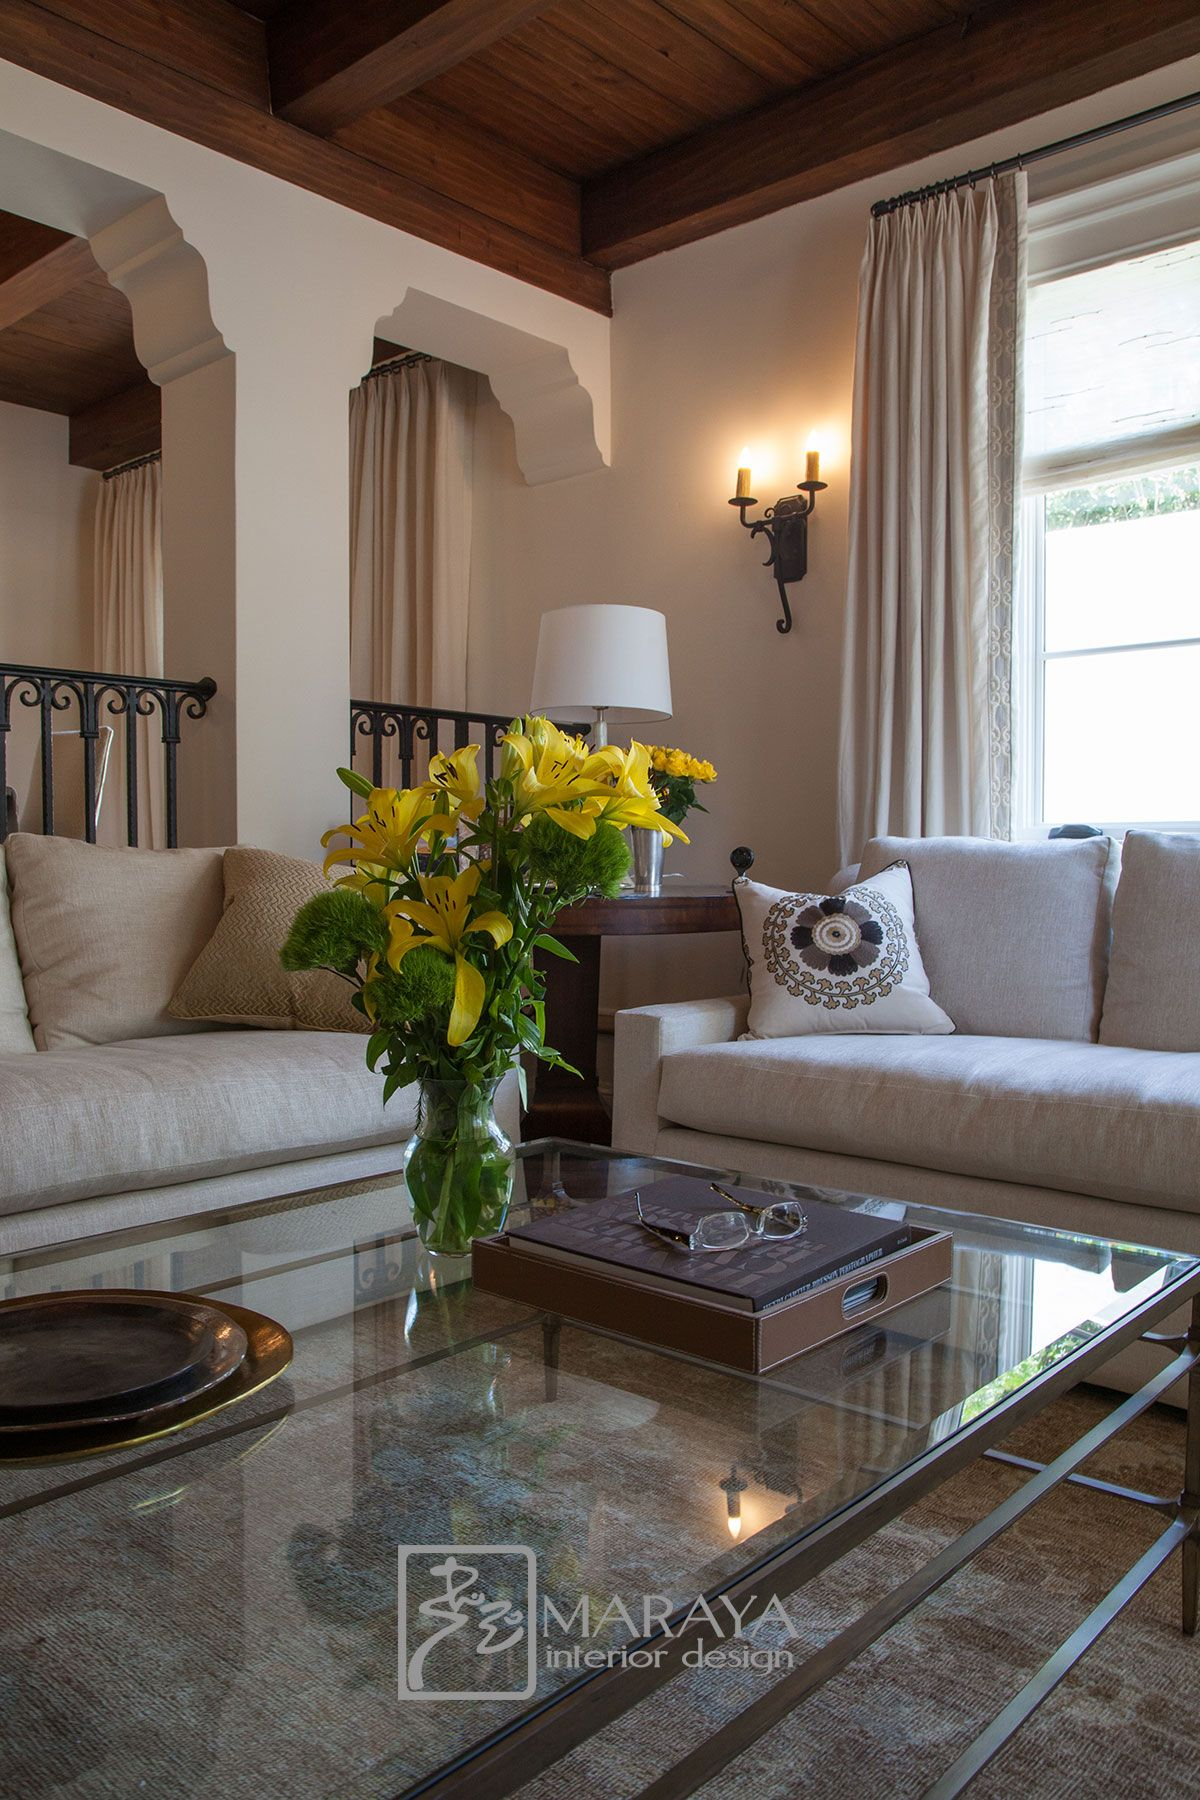 Spanish Modern Living Room Spanish Decor Living Room Spanish Home Decor Interior Design #spanish #style #decorating #living #room